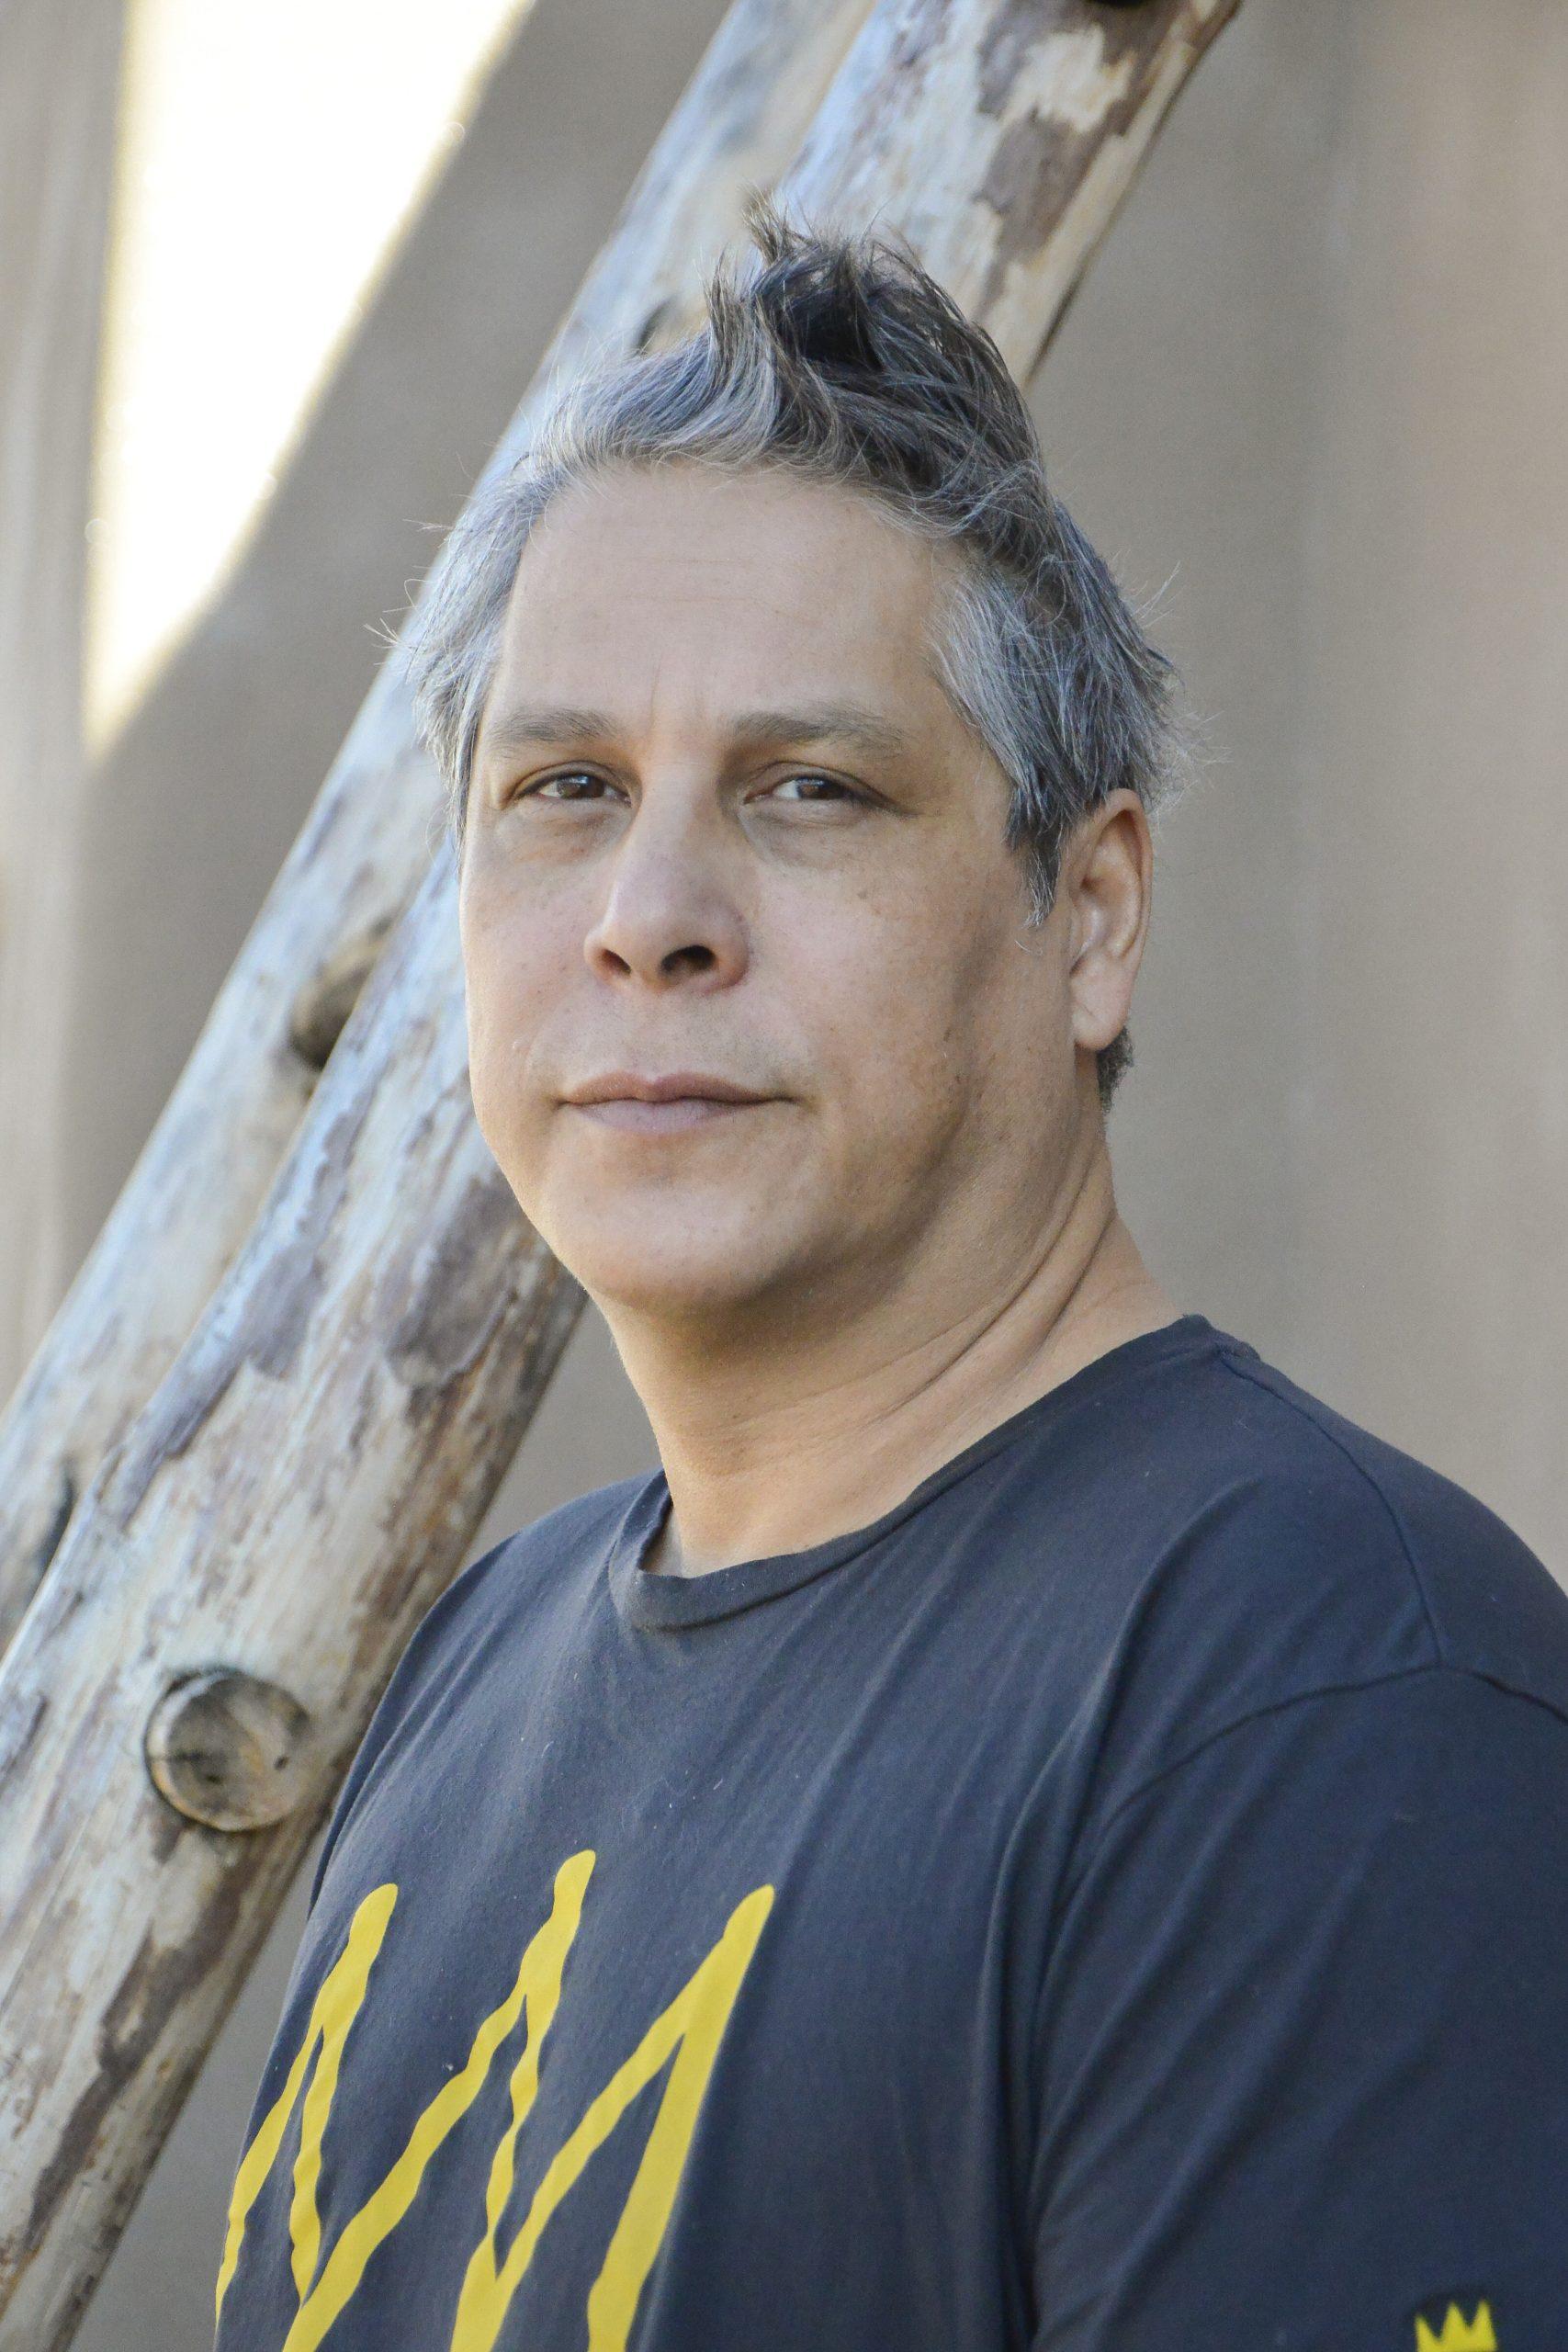 Mateo Romero, Native American Indian artist